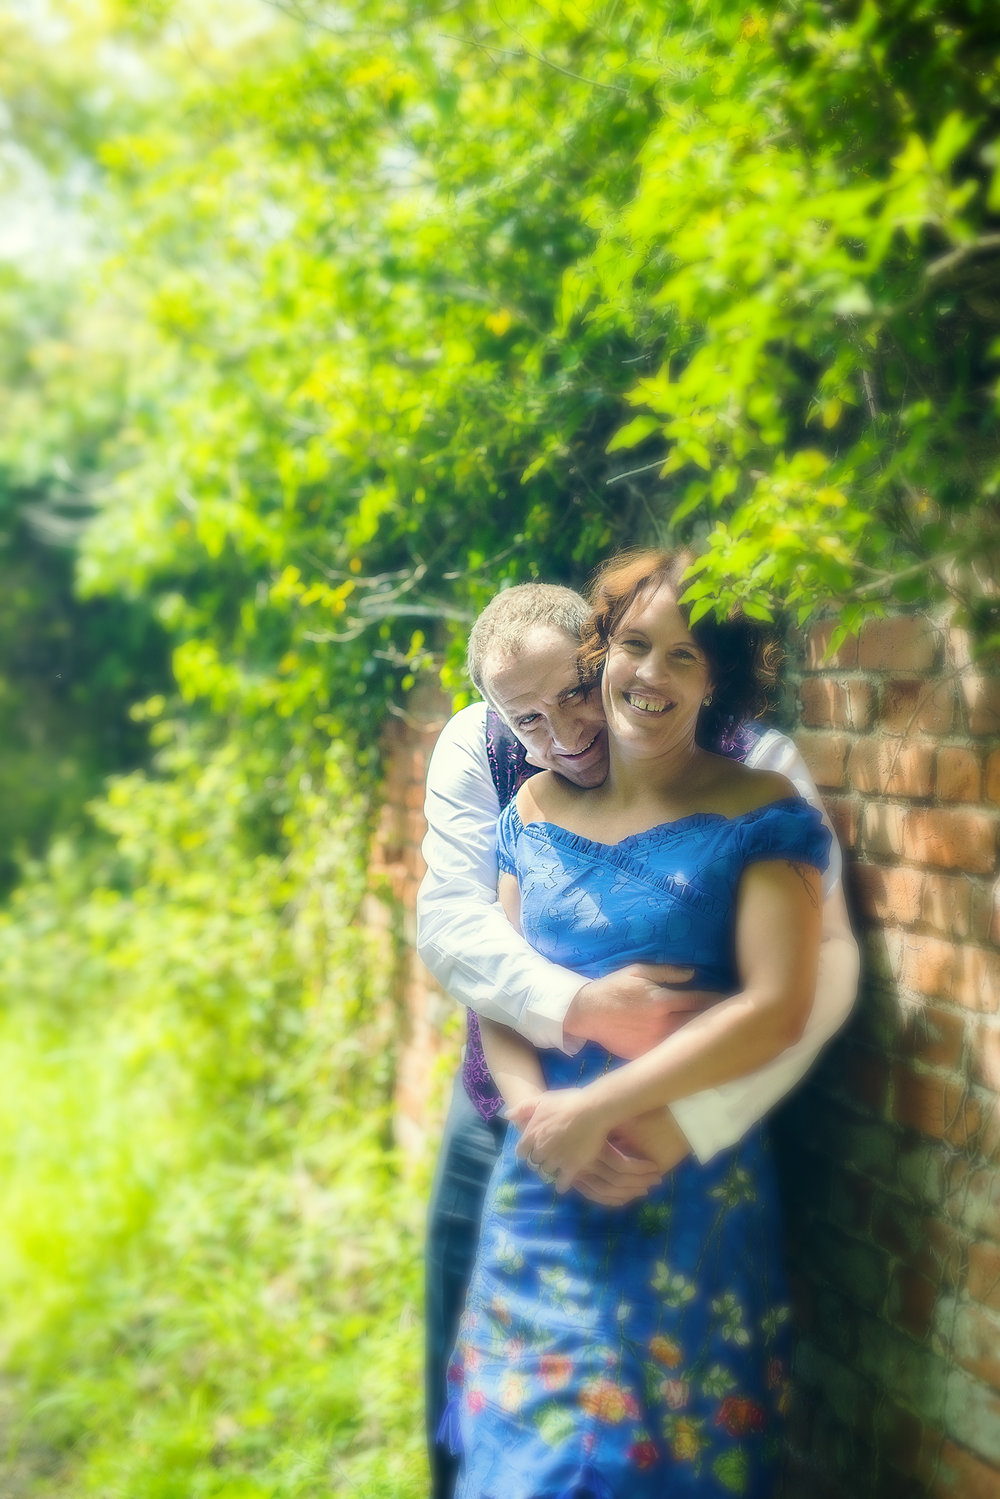 Studio Luxe Couples Photo-Shoots